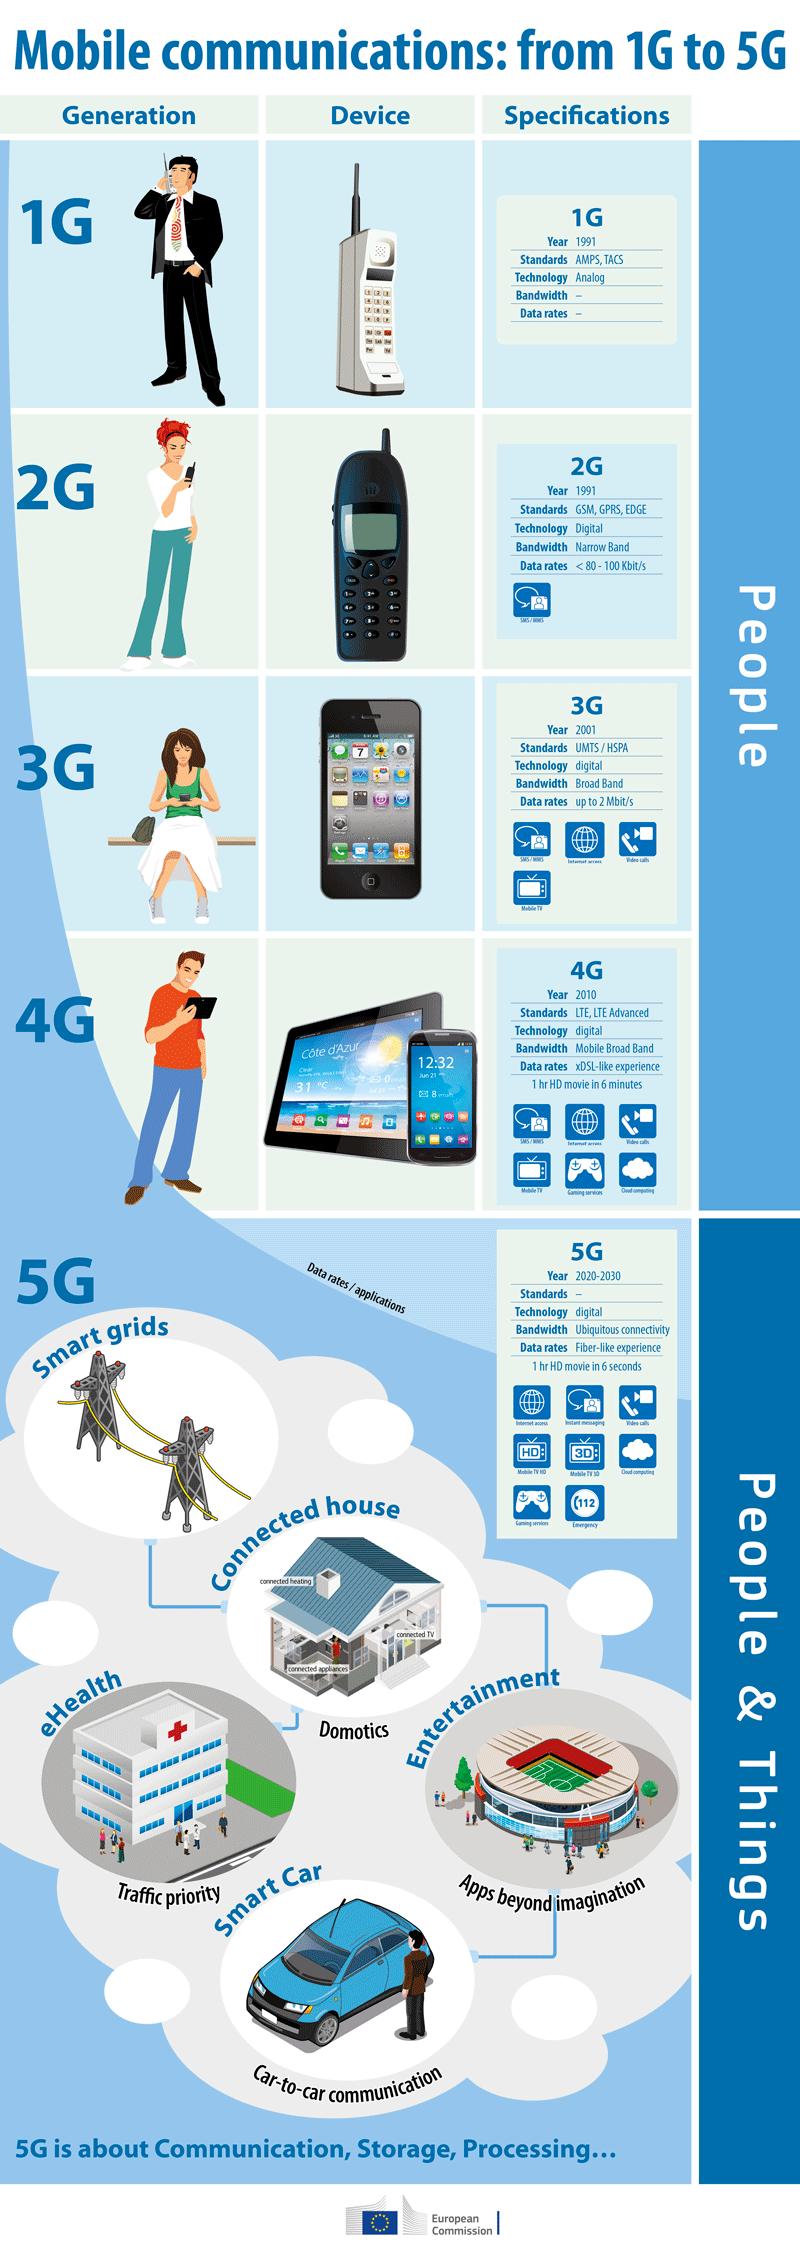 Komunikacja mobilna od 1G do 5G - infografika